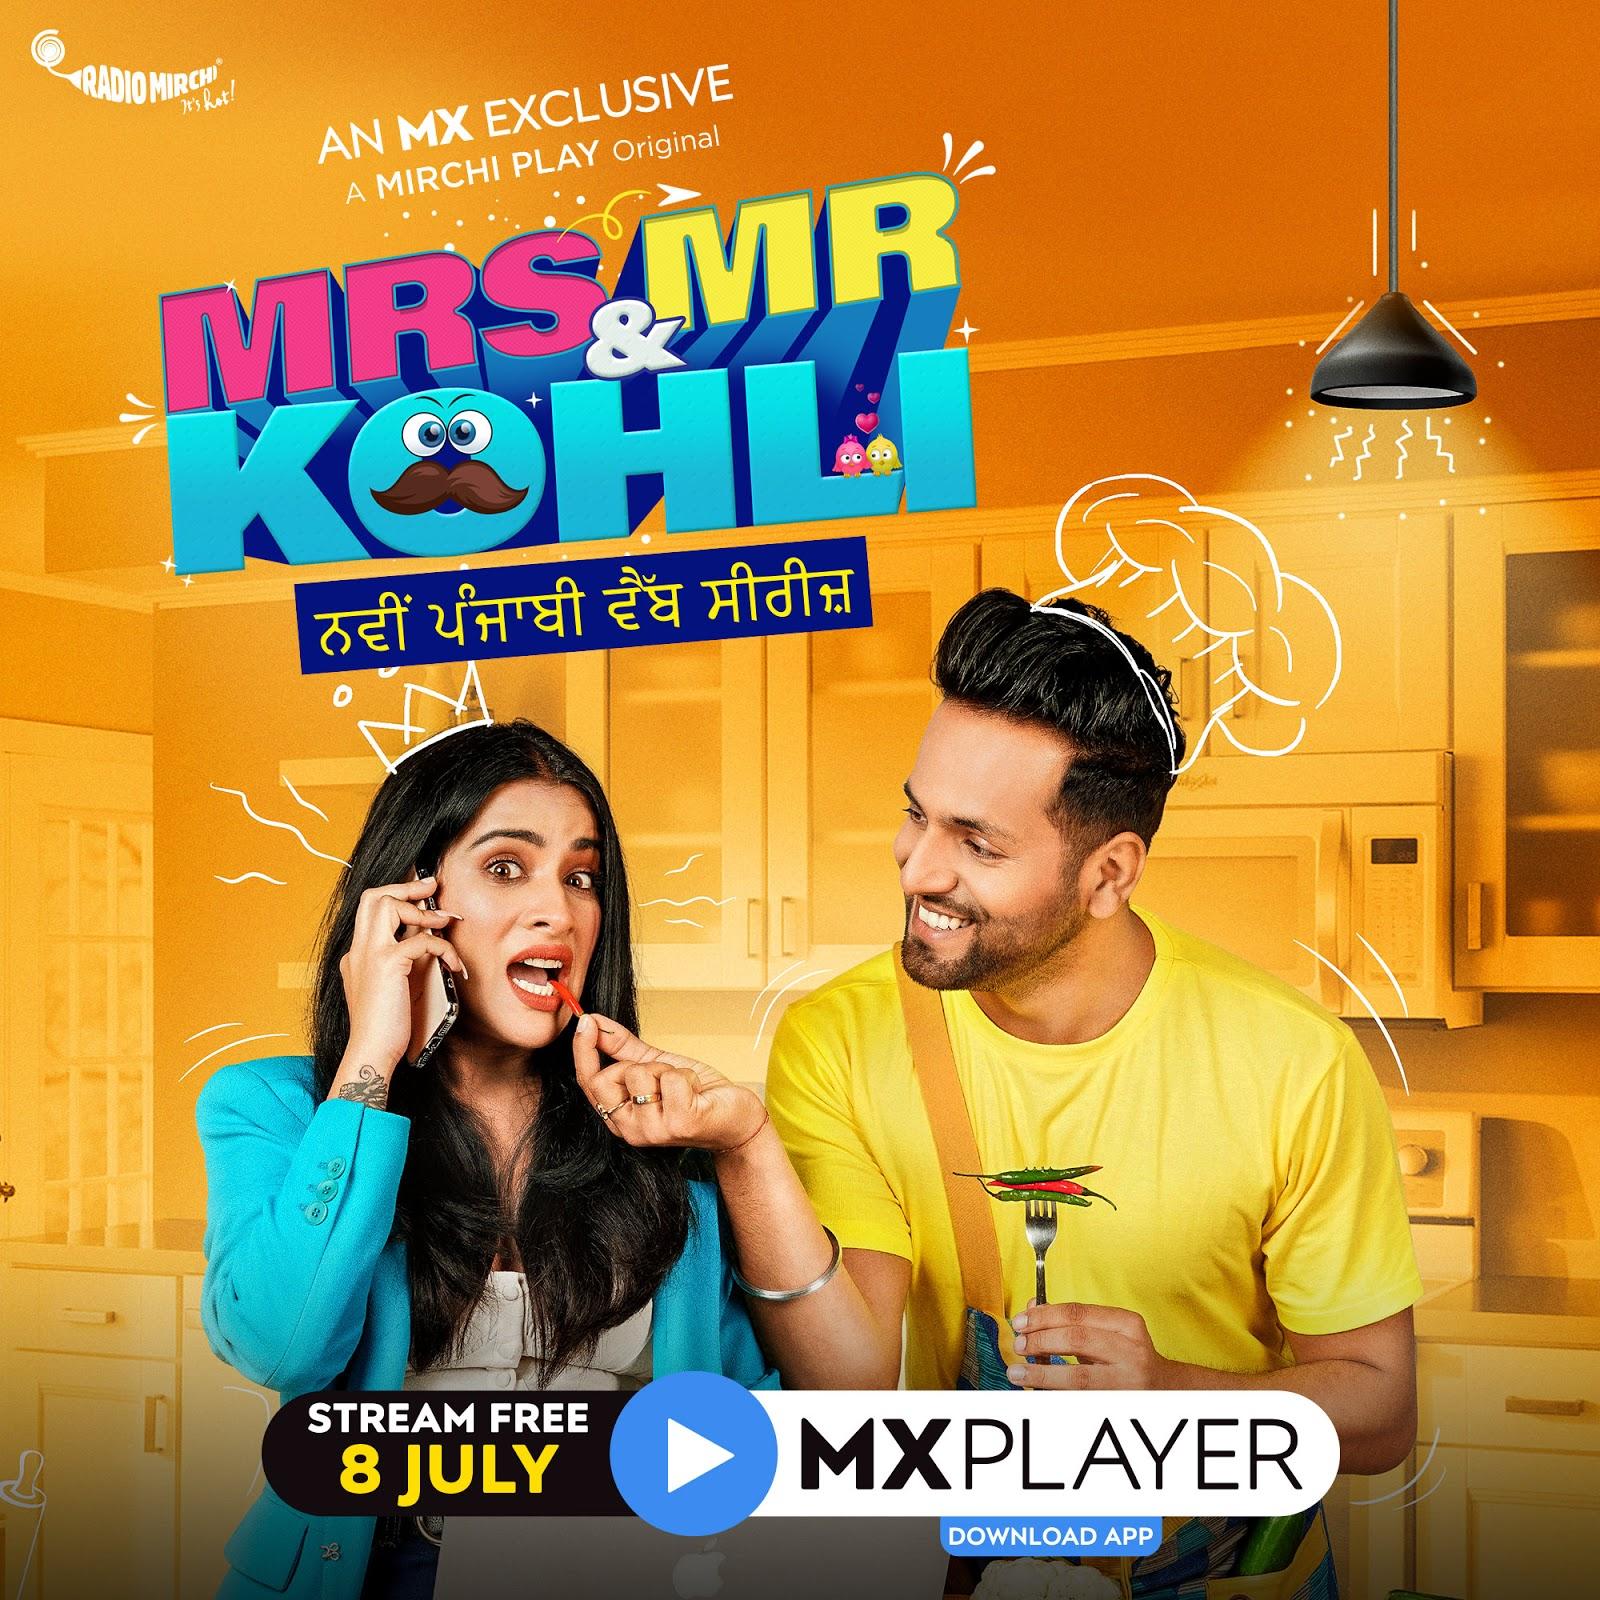 Mumbai News Network Latest News: MX Player's latest series 'Mrs ...